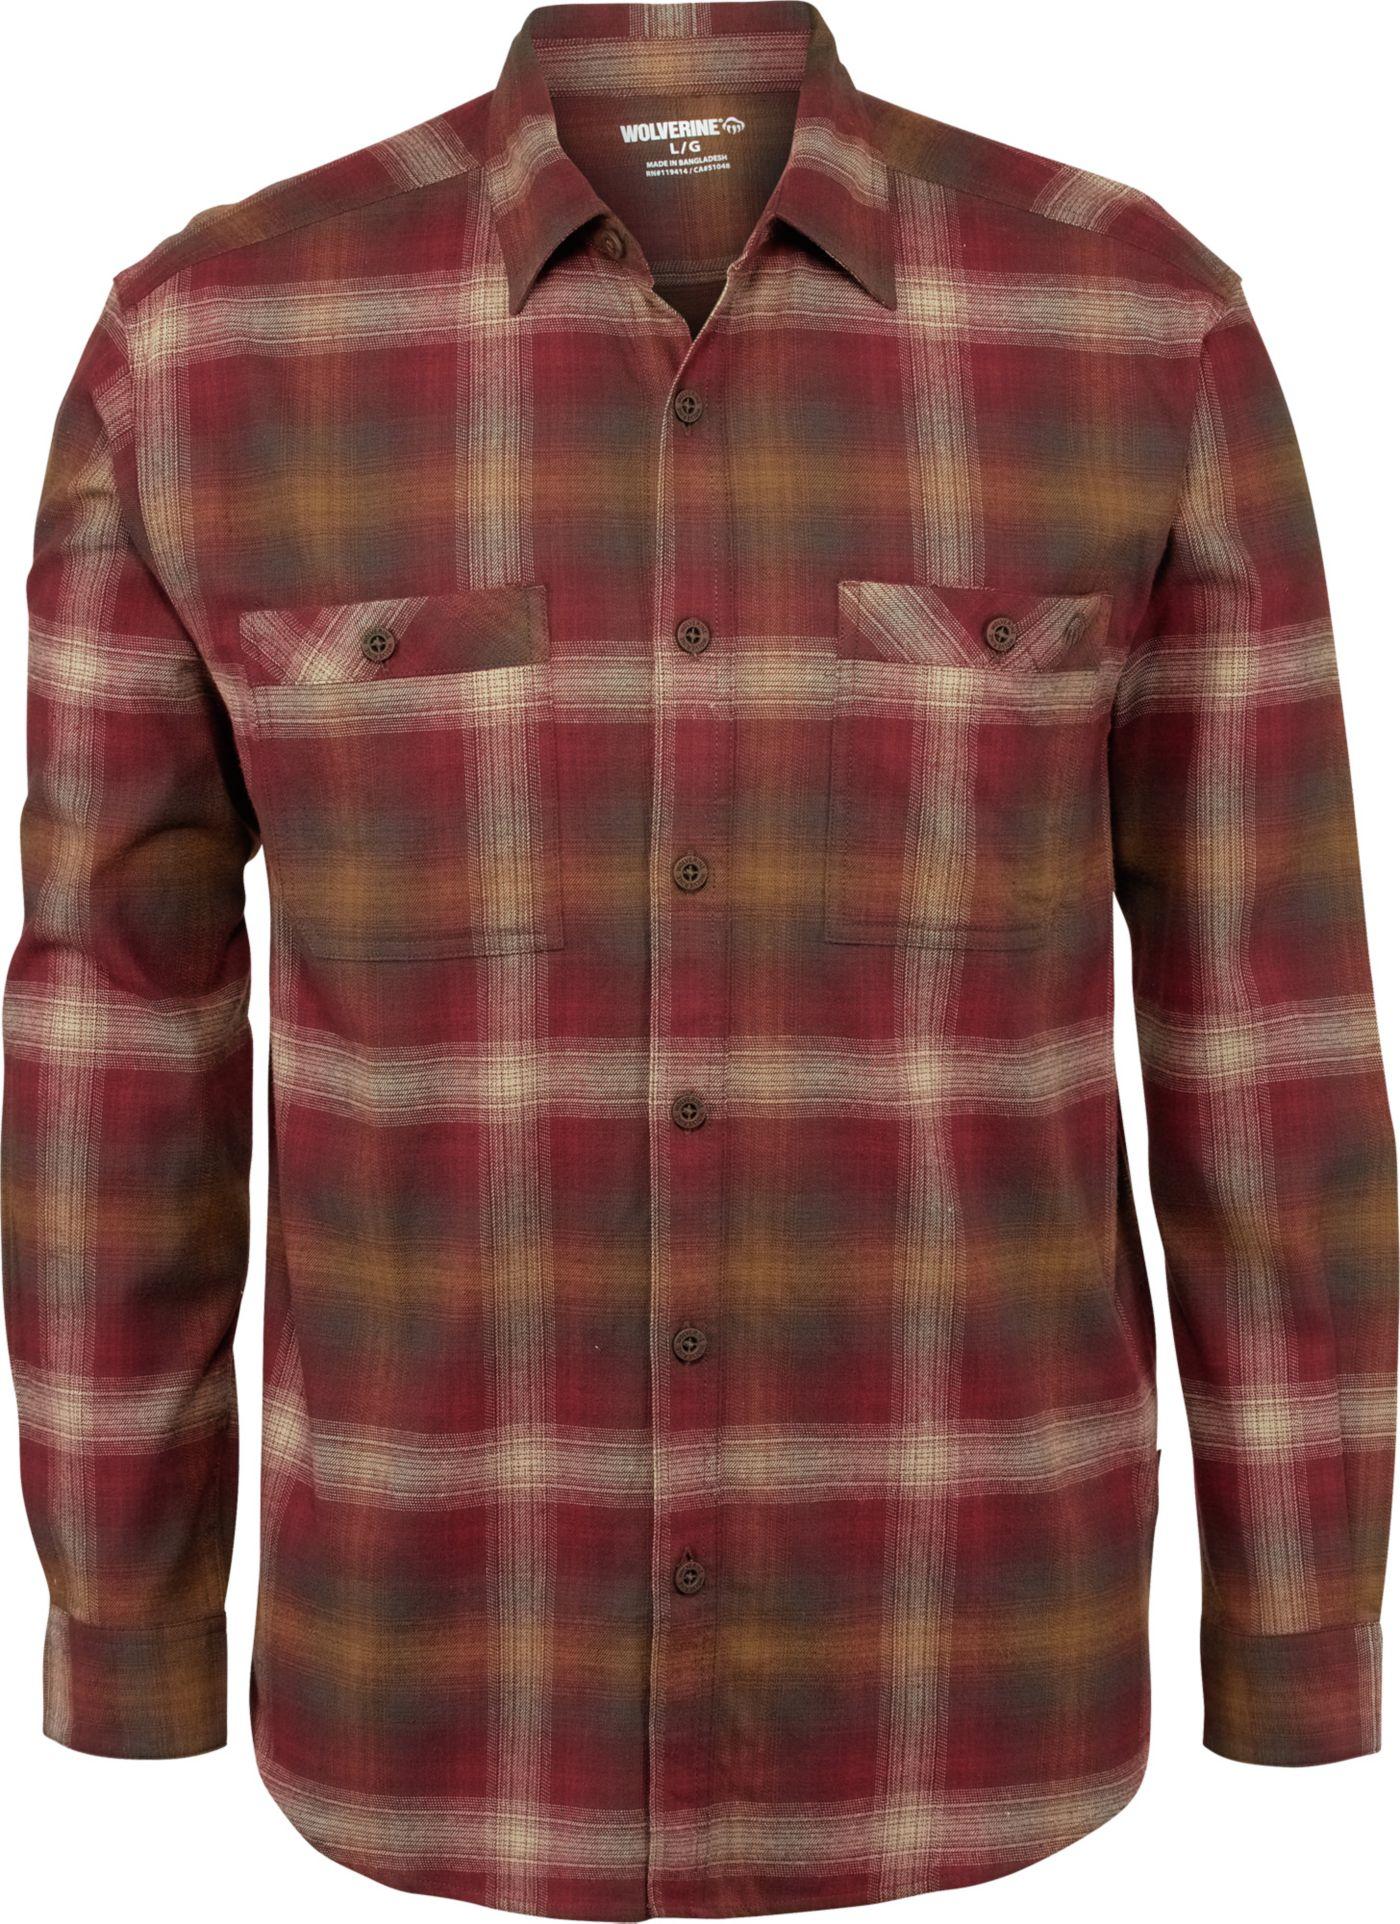 Wolverine Men's Grayson Stretch Long Sleeve Flannel Shirt